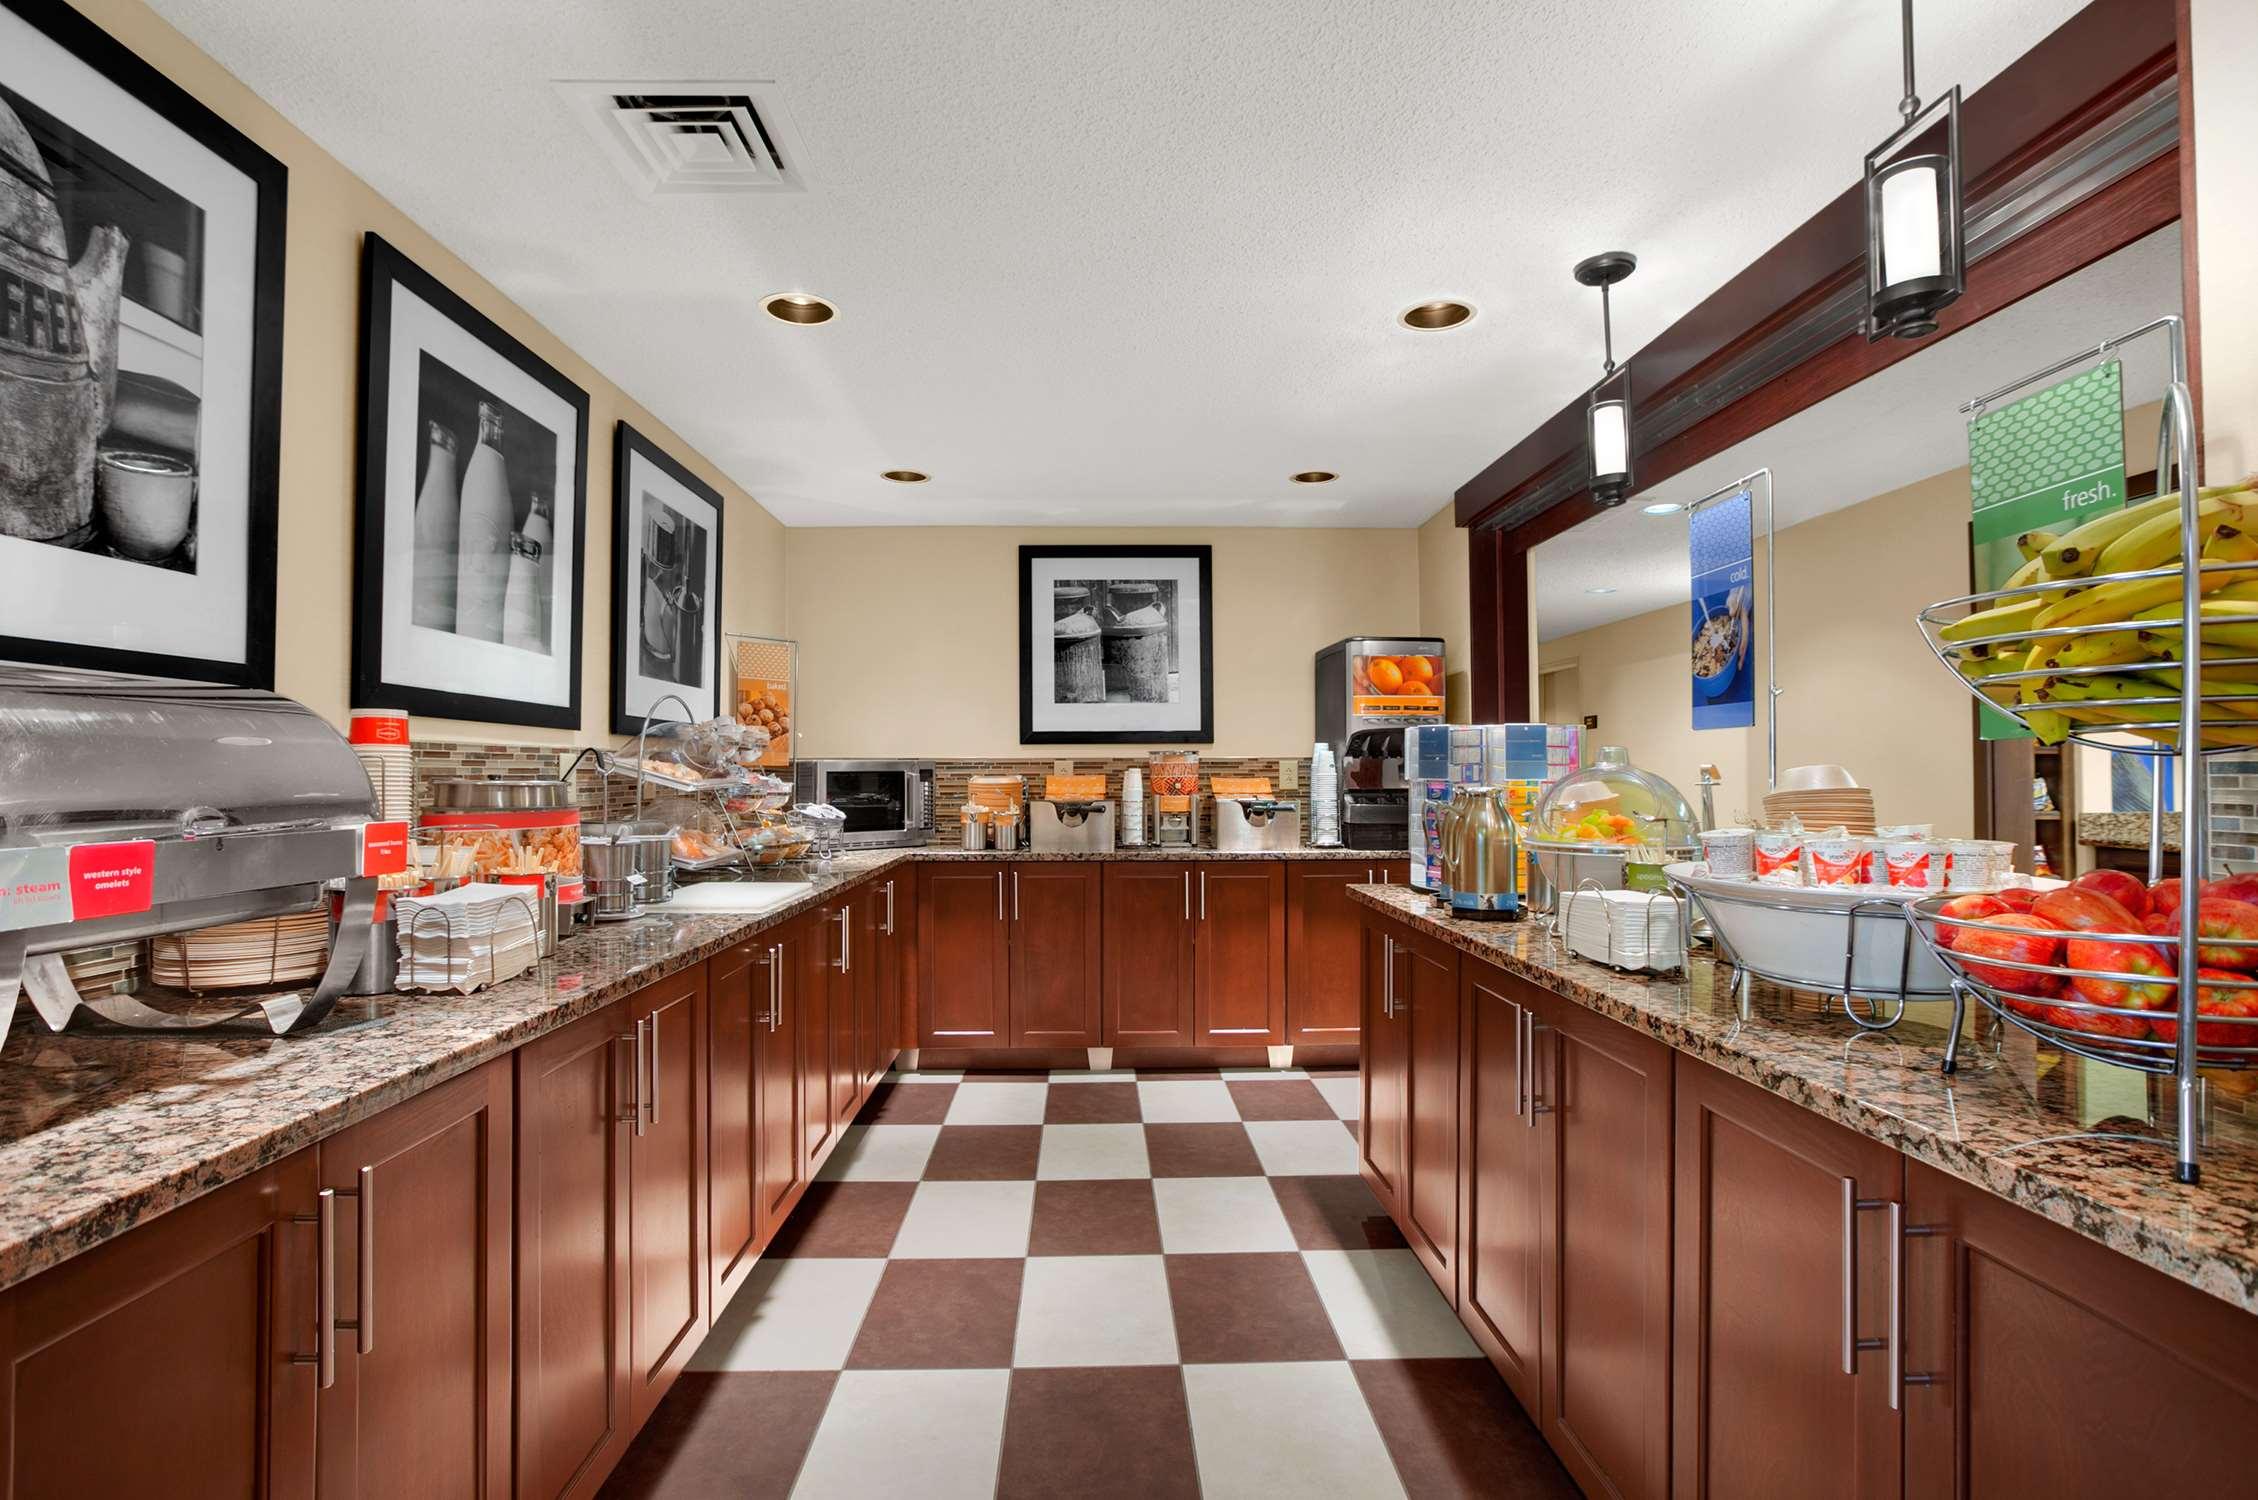 Hampton Inn & Suites Newport News (Oyster Point) image 9